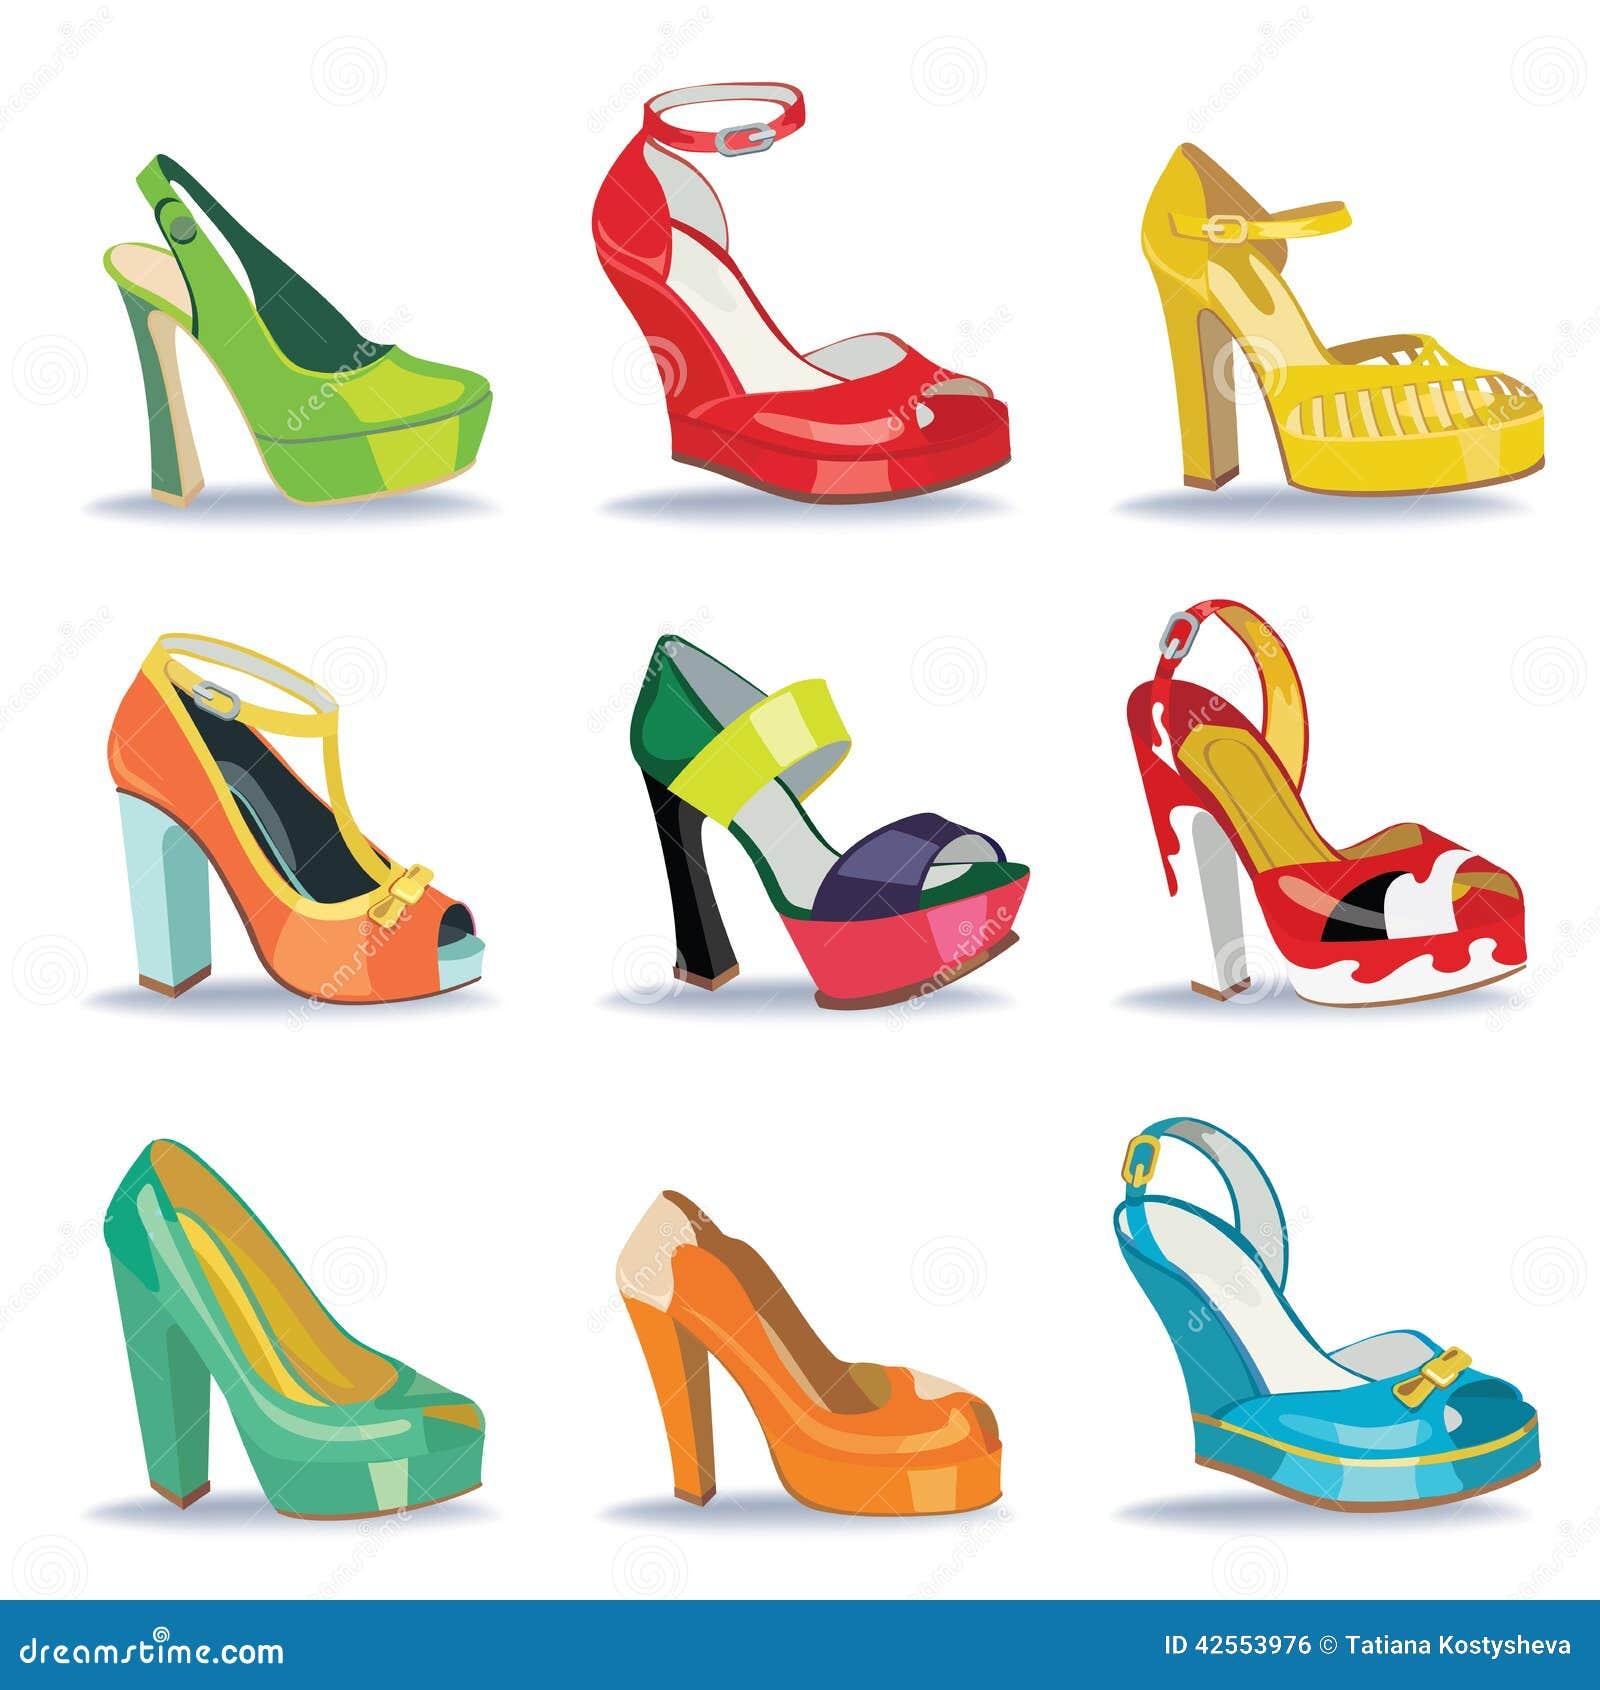 Femme Chaussures Femme Colorées Chaussures Femme Chaussures Femme Chaussures Colorées Colorées Colorées Chaussures Femme Chaussures Colorées YD9IEHb2eW